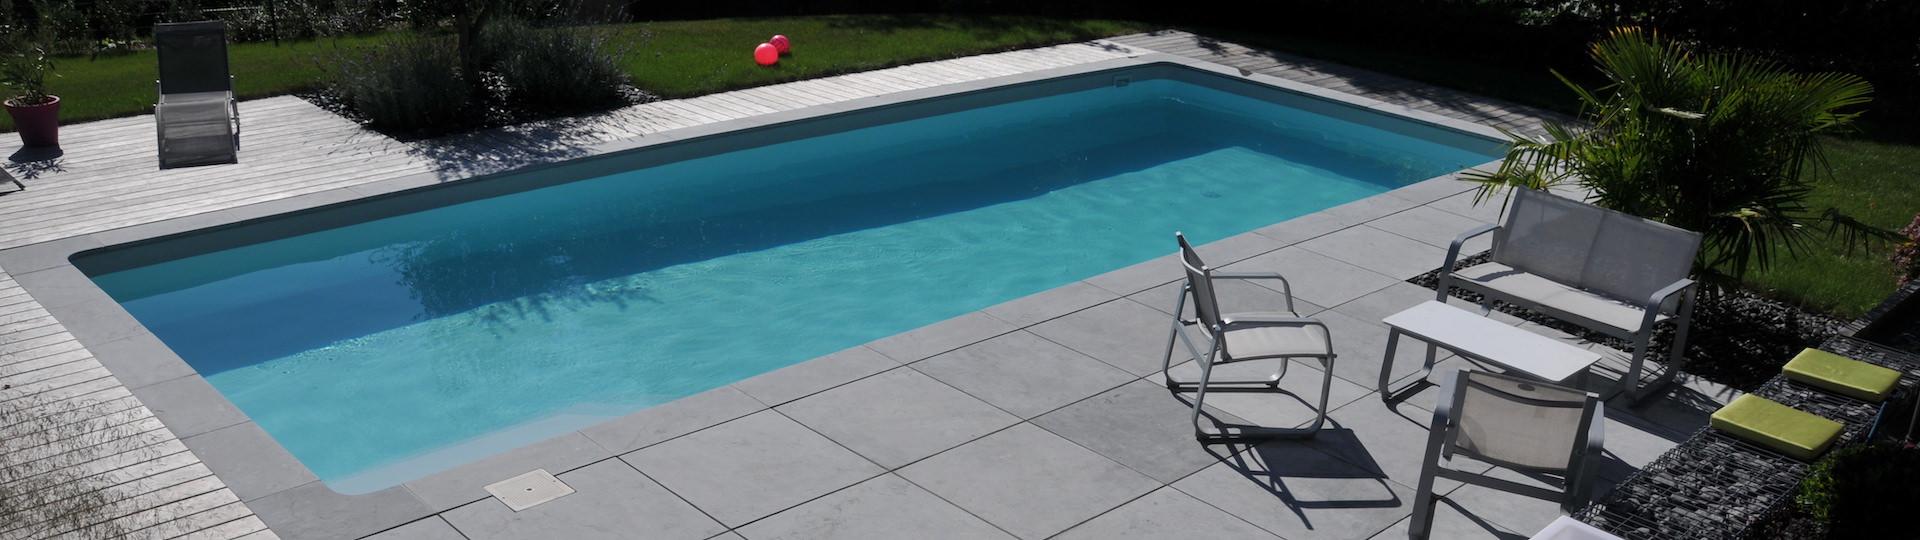 Piscines VINET, pisciniste à Nantes